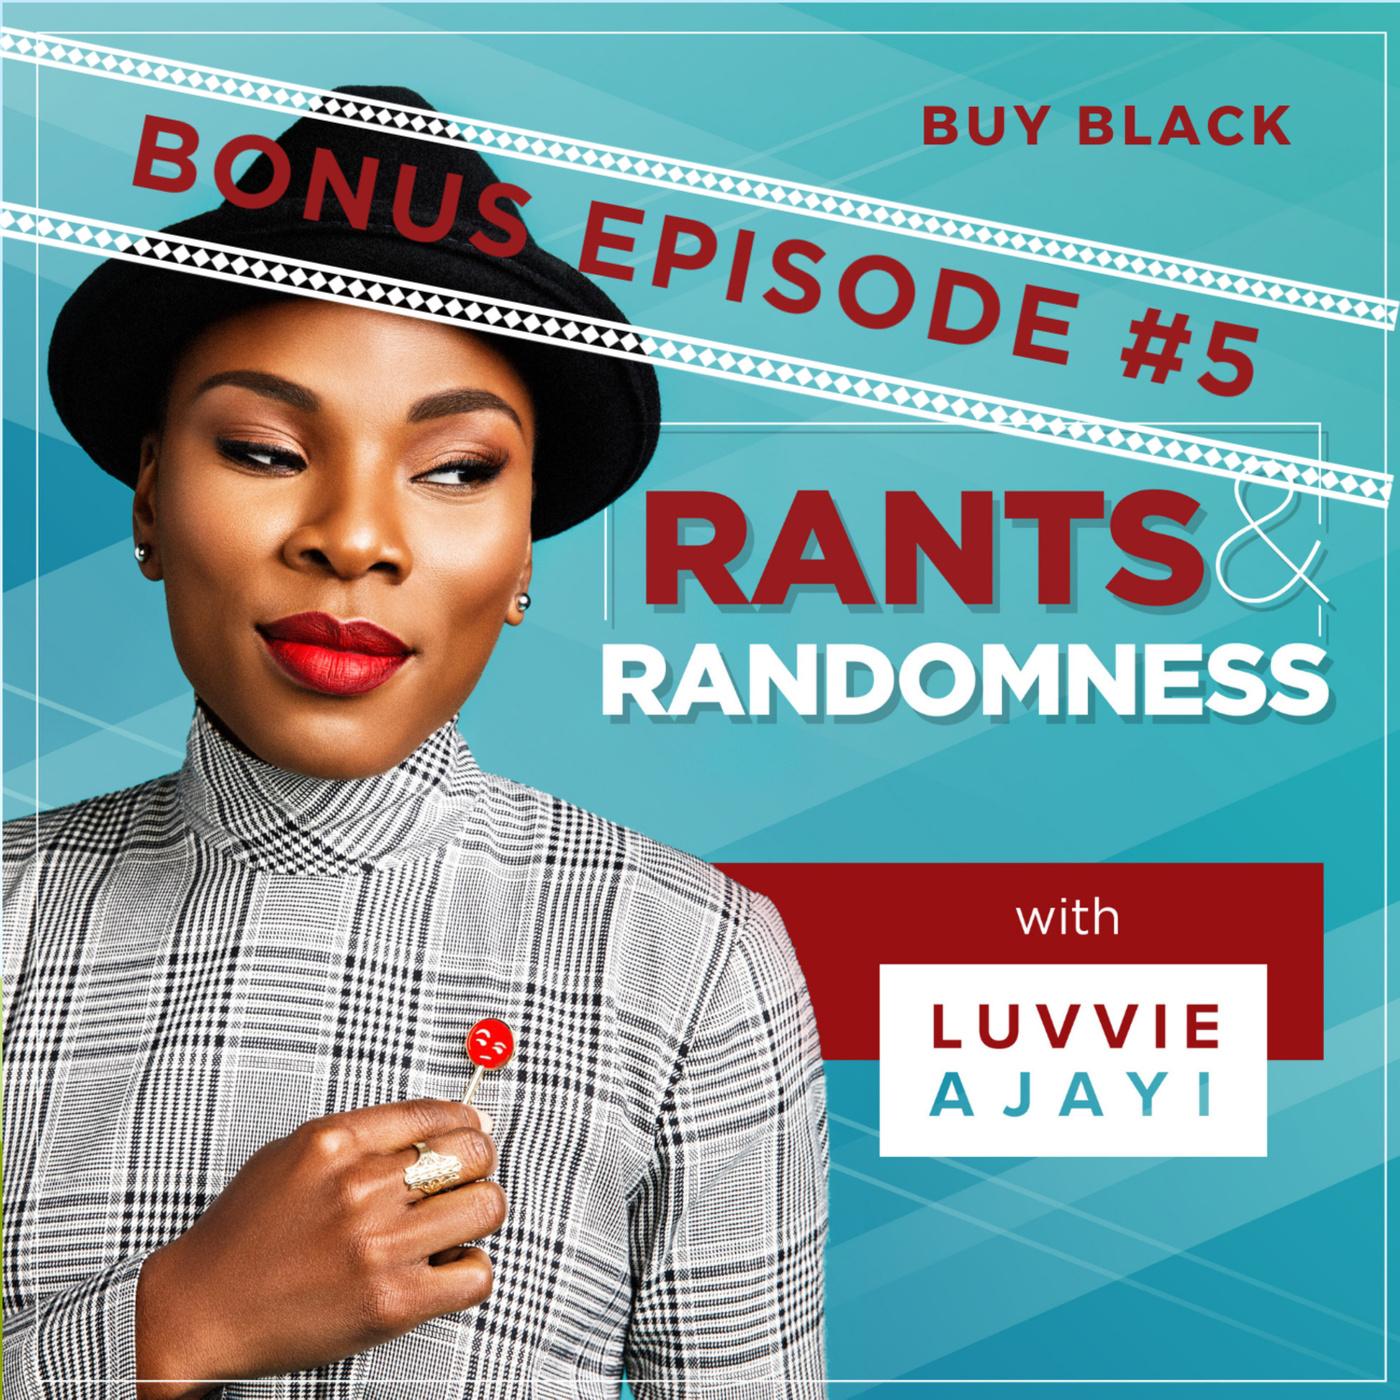 #BuyBlack - Bonus Episode 5